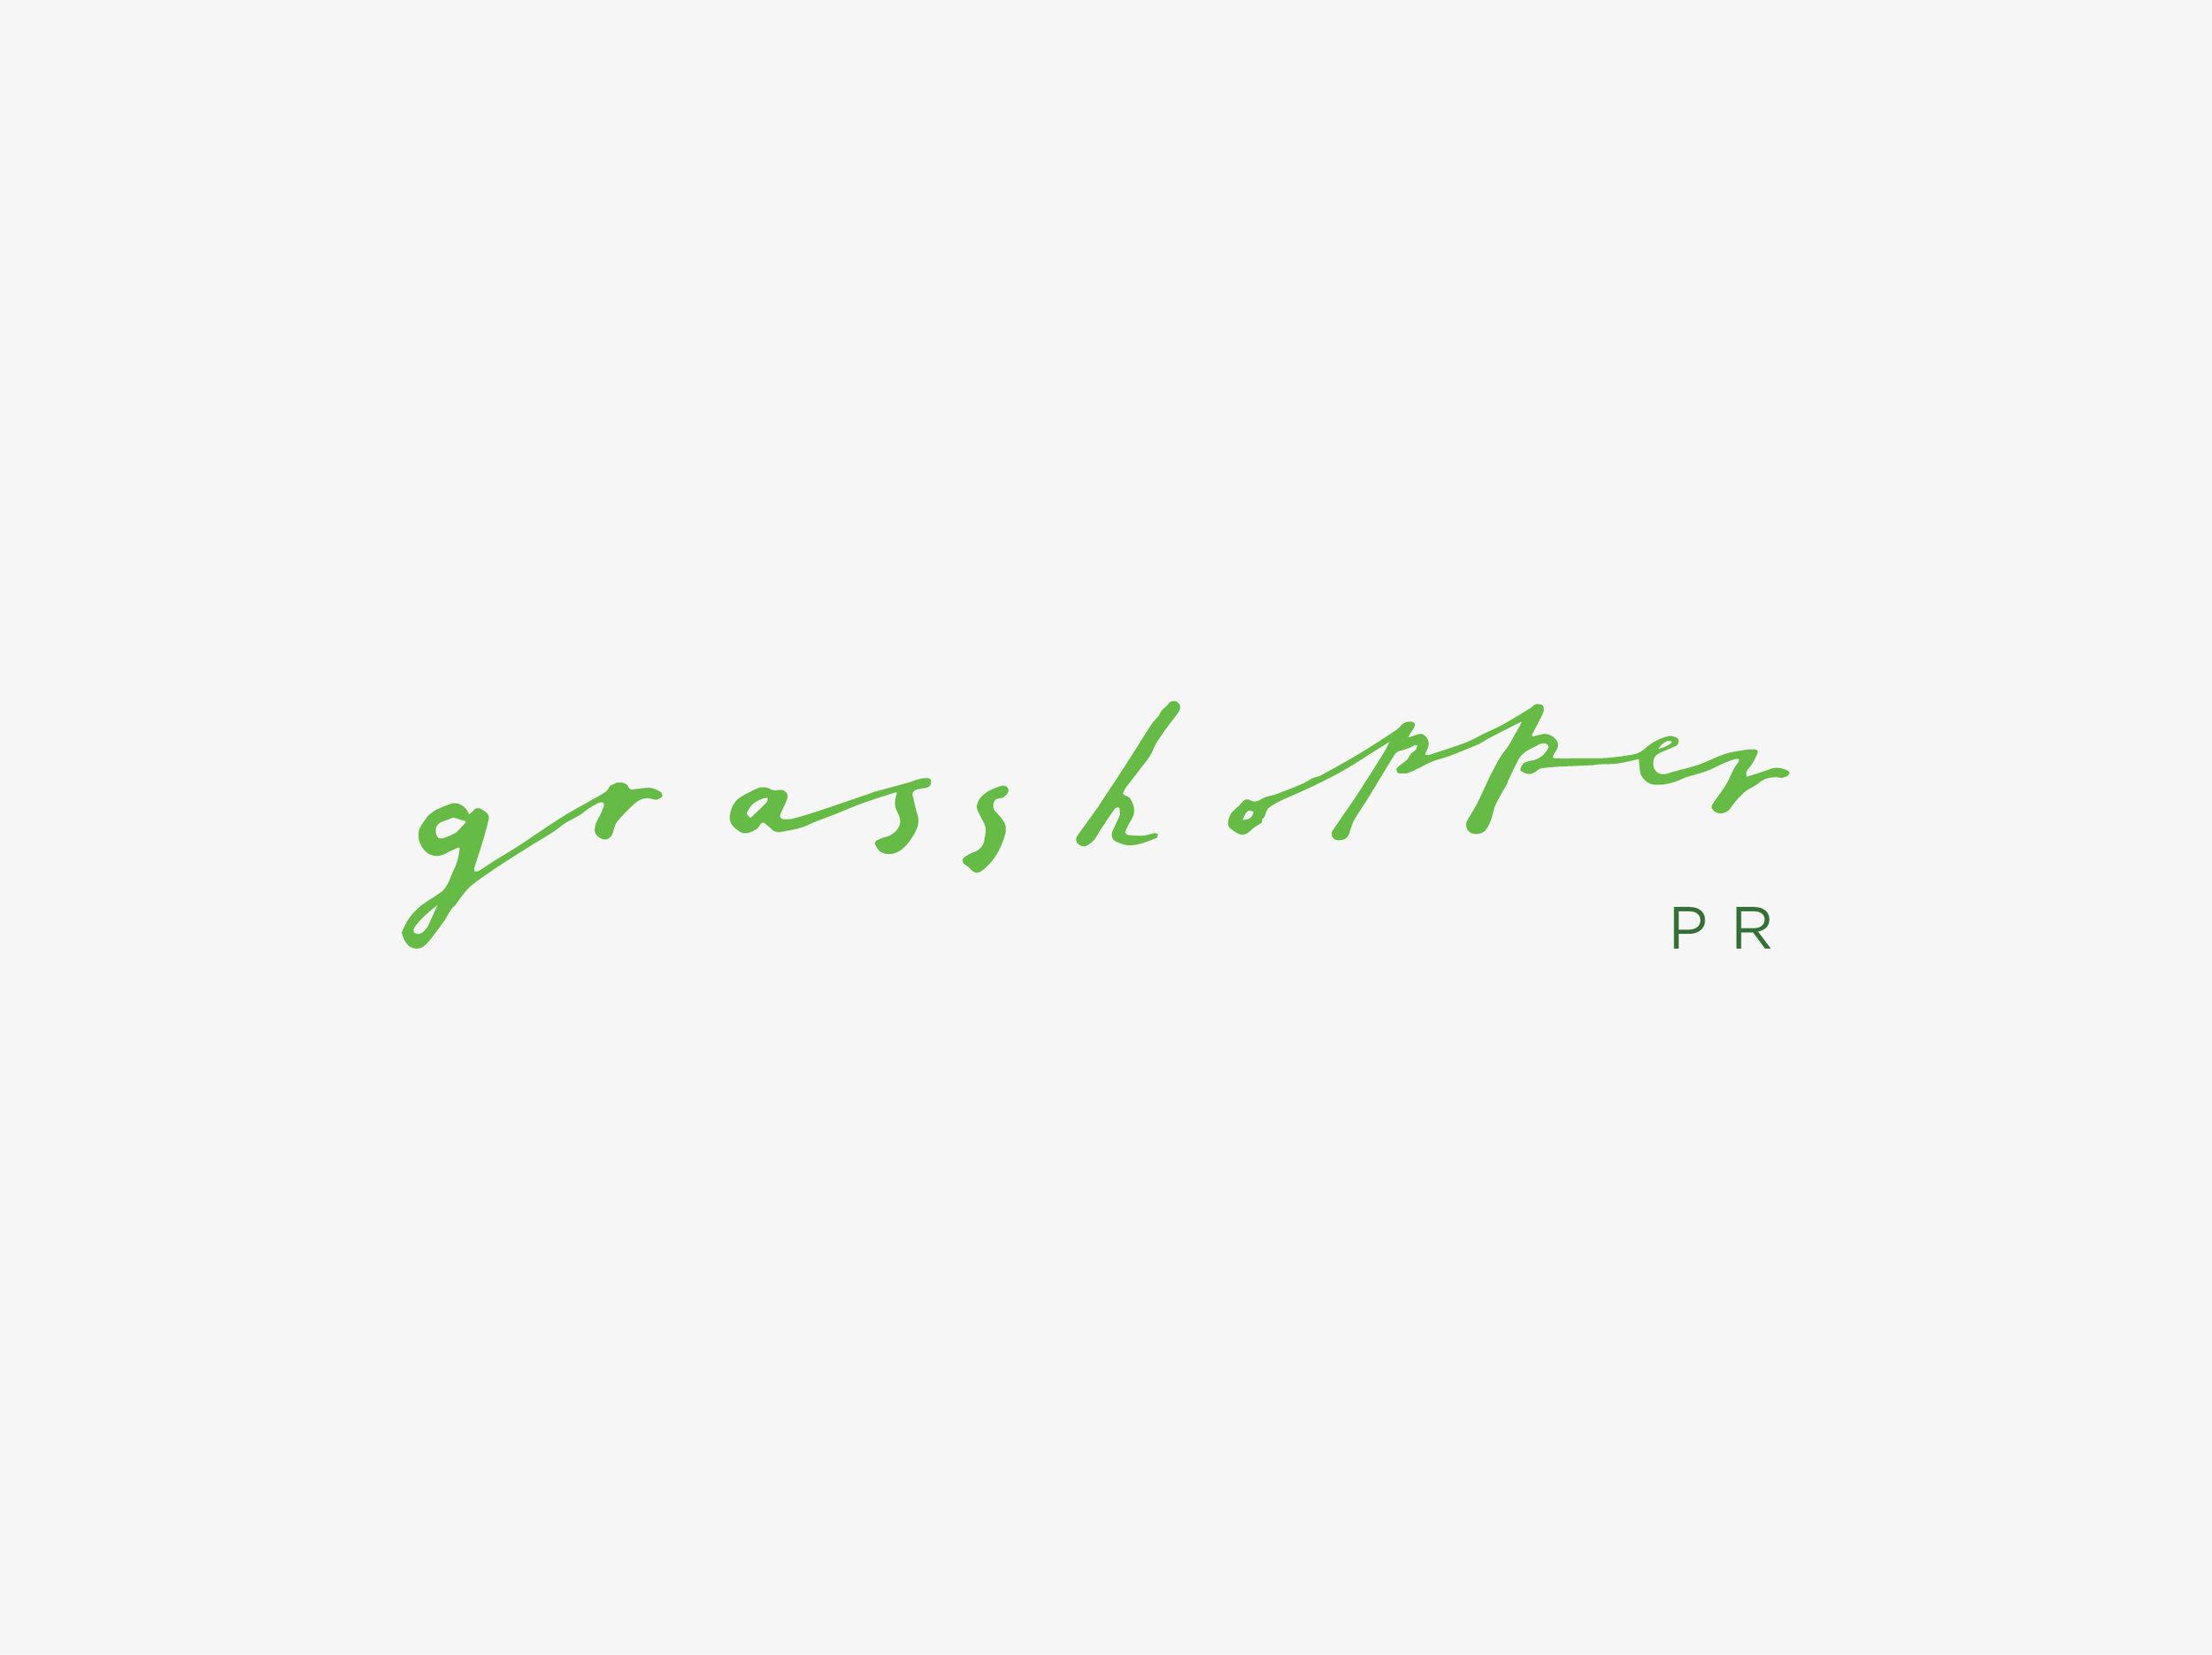 Grasshopper by Belinda Love Lee